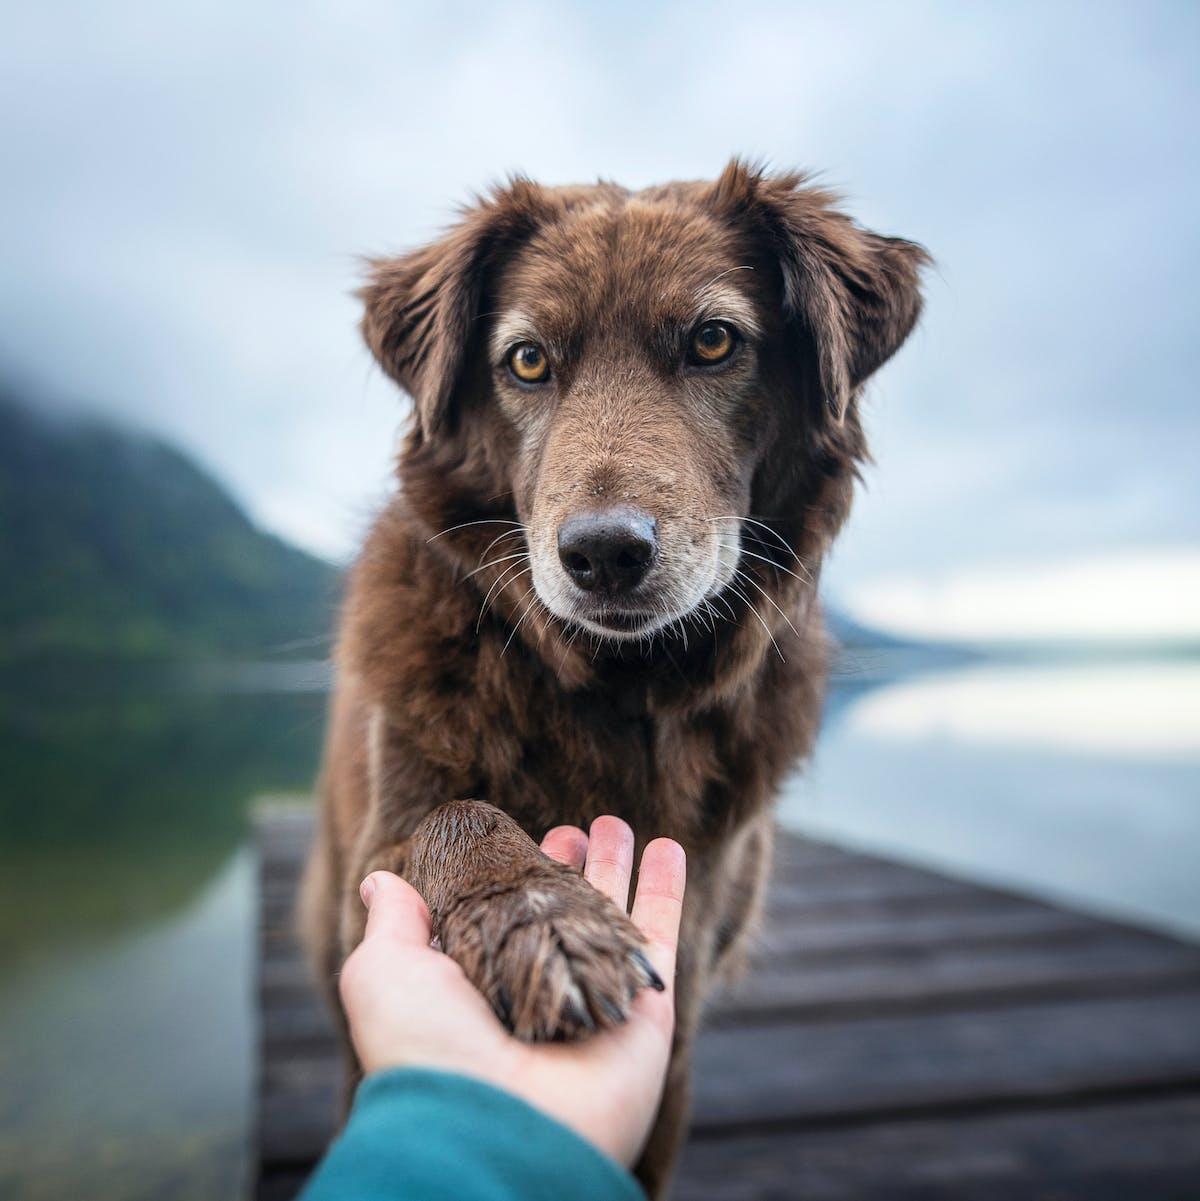 """Companion dog acquisition"" has a scientifically proven benefit"